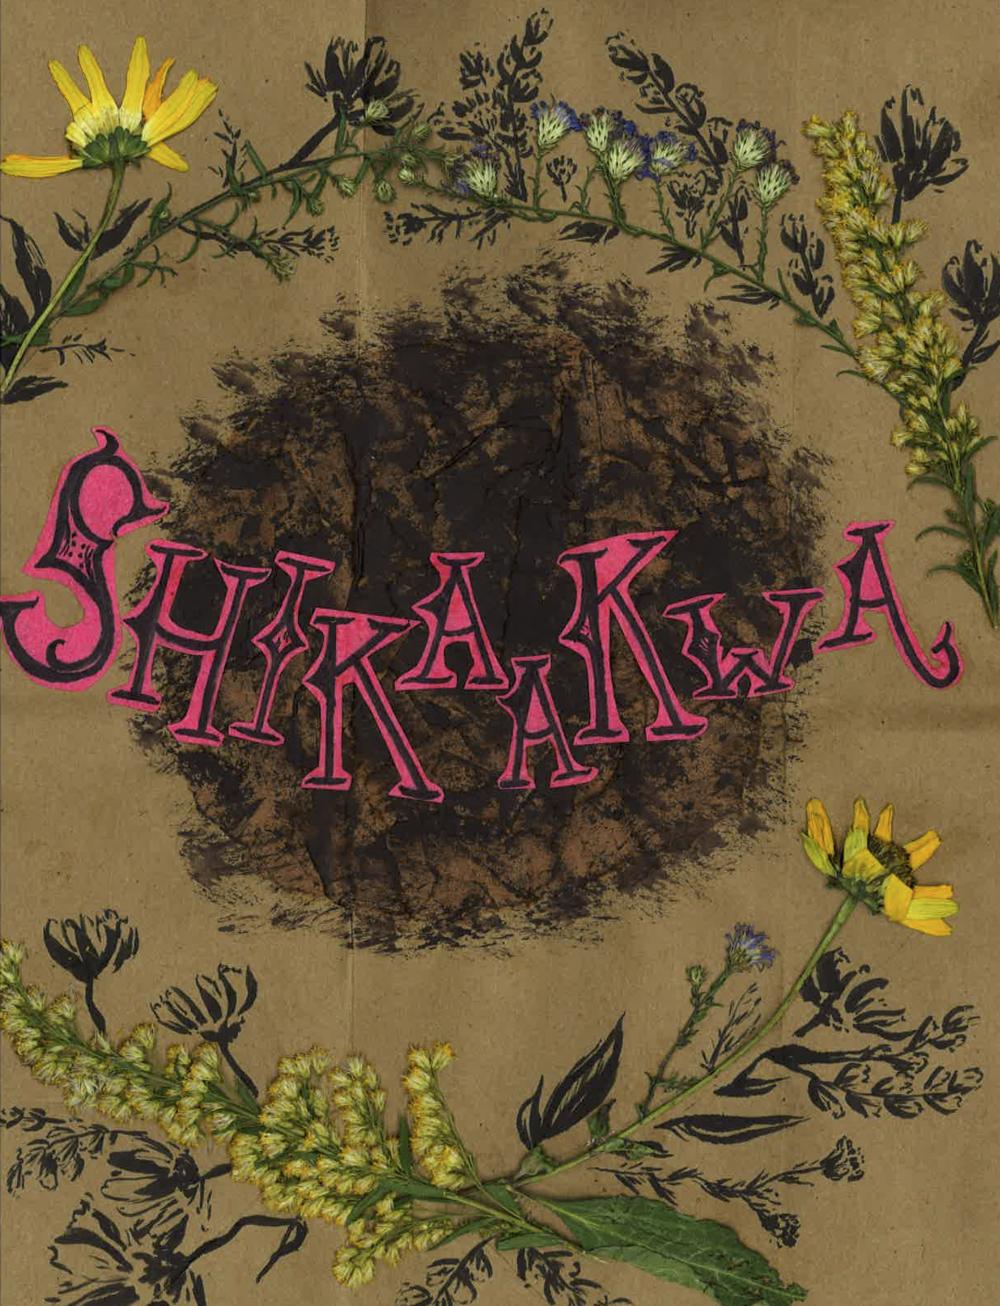 Shikaakwa scrapbook Cover